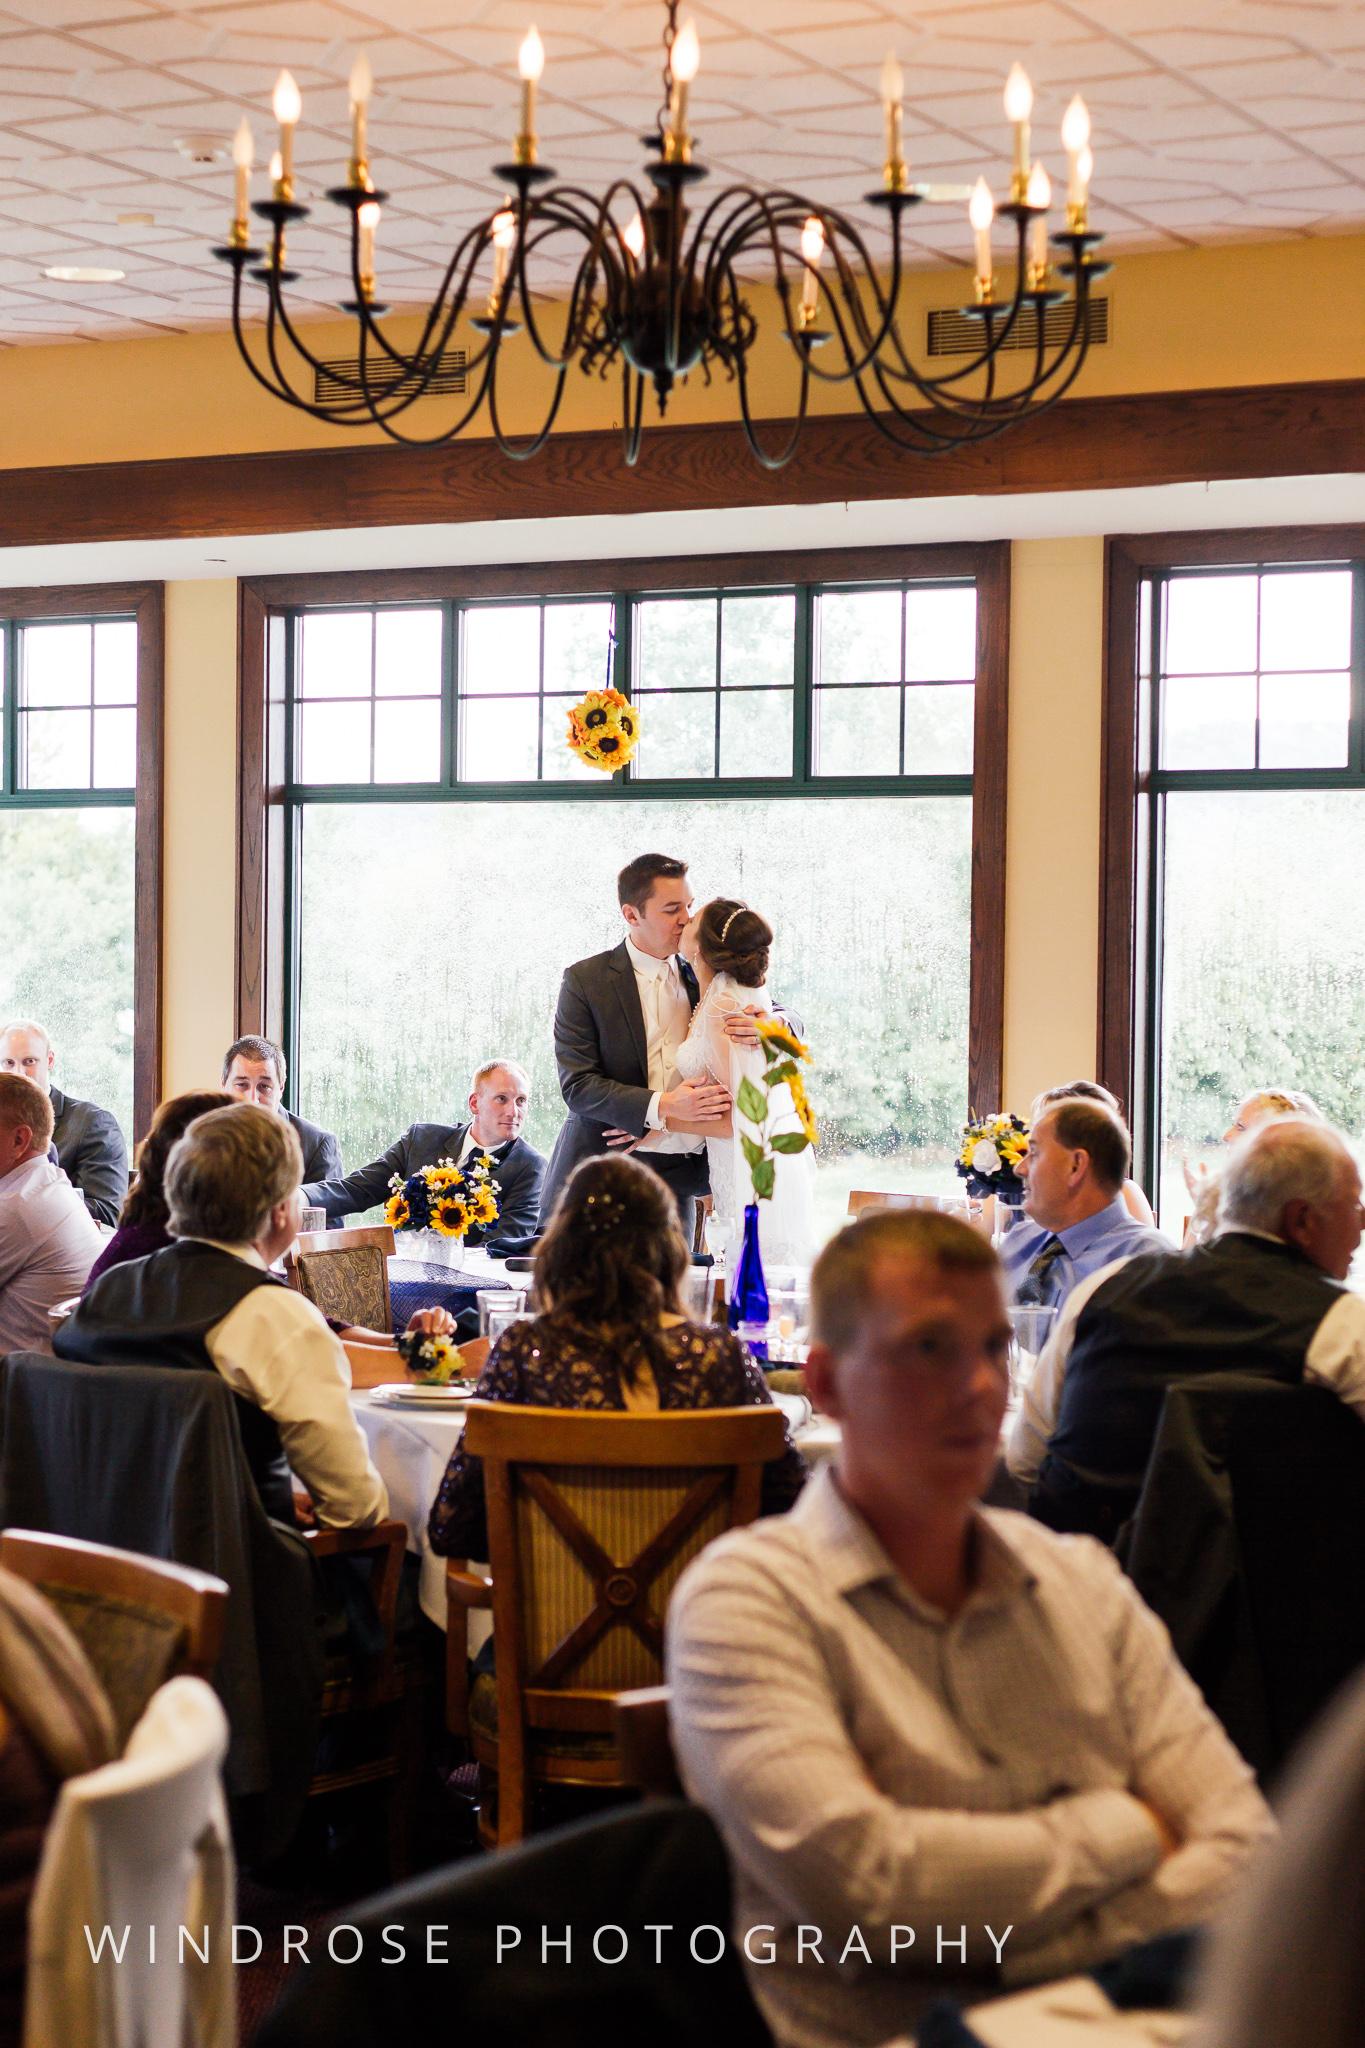 La-Crosse-Country-Club-Wedding-Minnesota-Wedding-Photographer-39.jpg